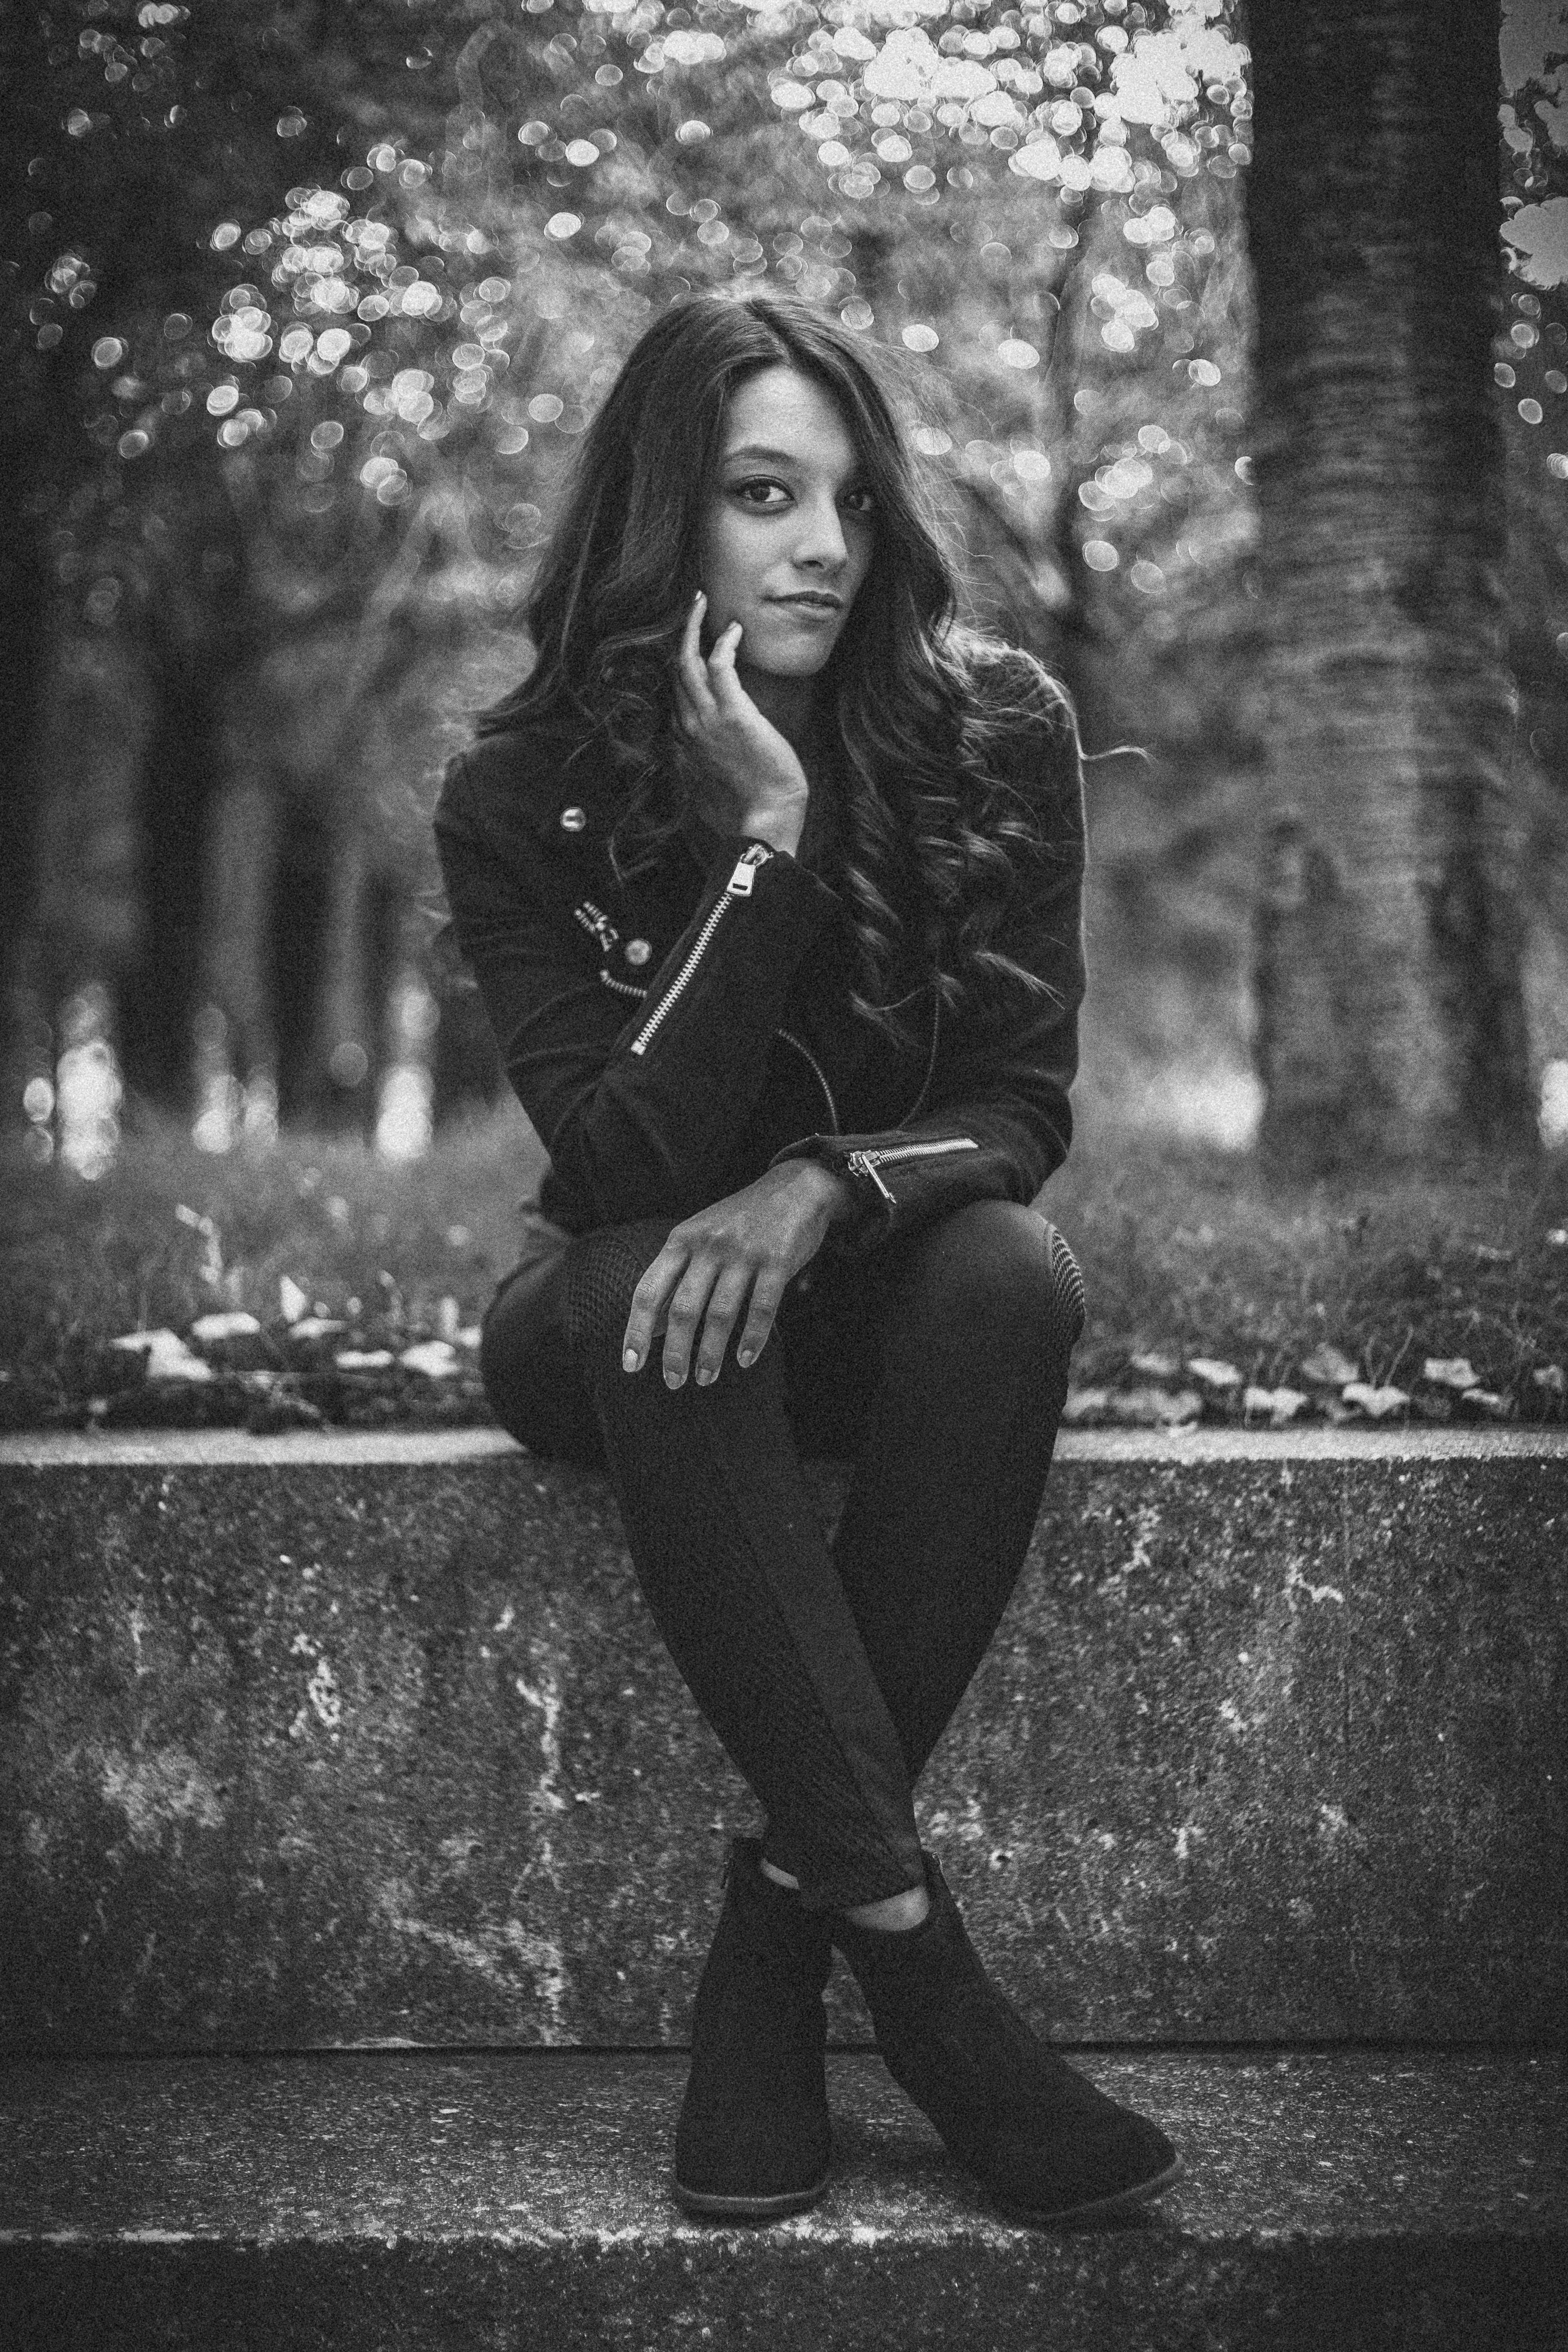 Monochrome Photo of Woman Sitting On Ledge